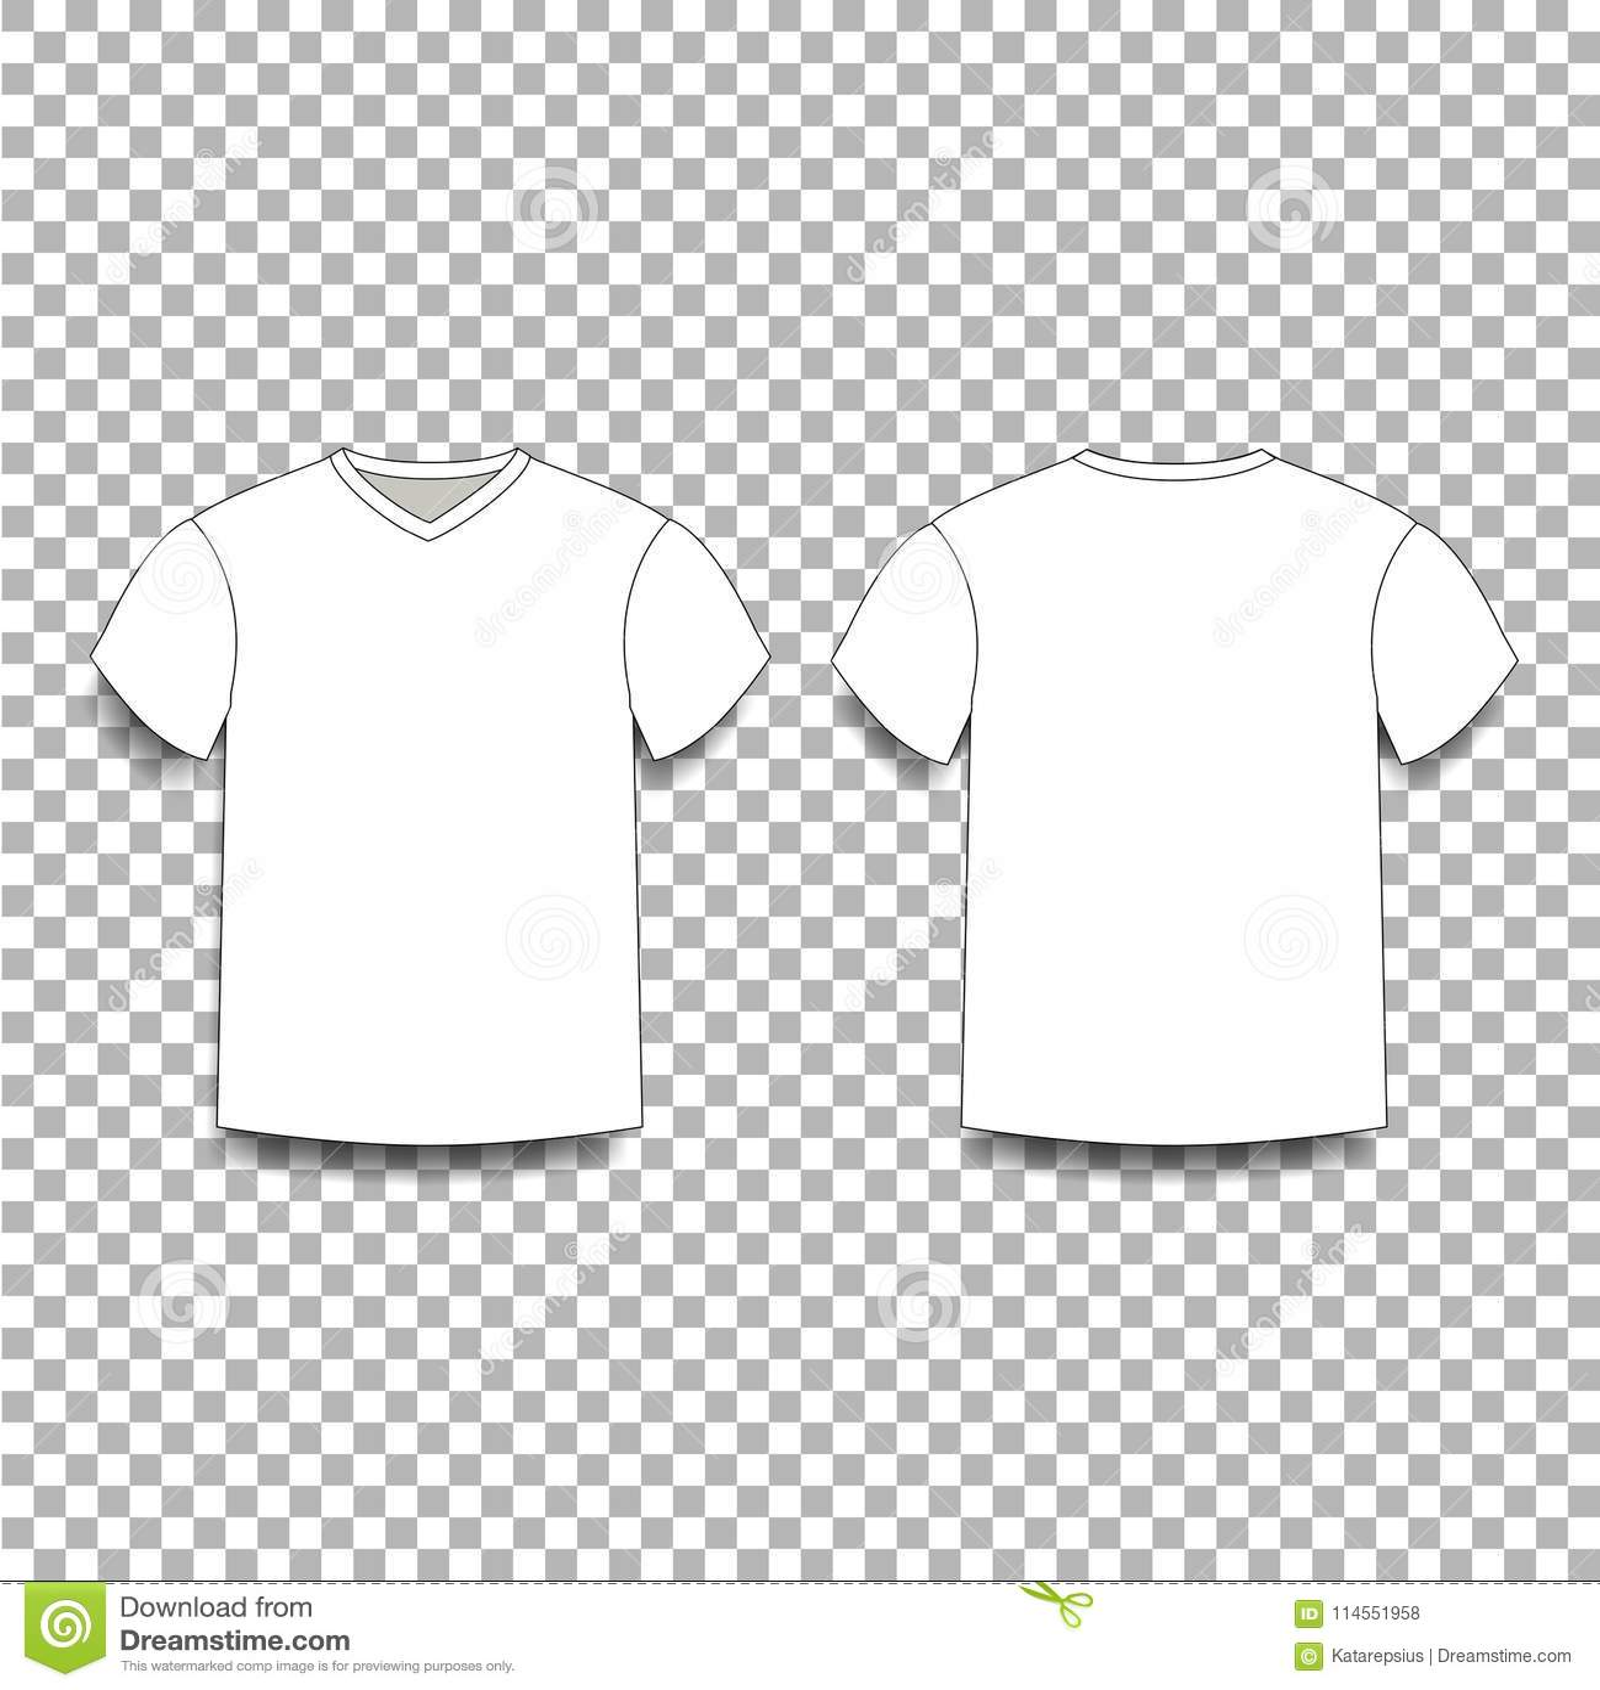 eae81e00 White Men`s T-shirt Template V-neck Front And Back Side Views. Stock ...